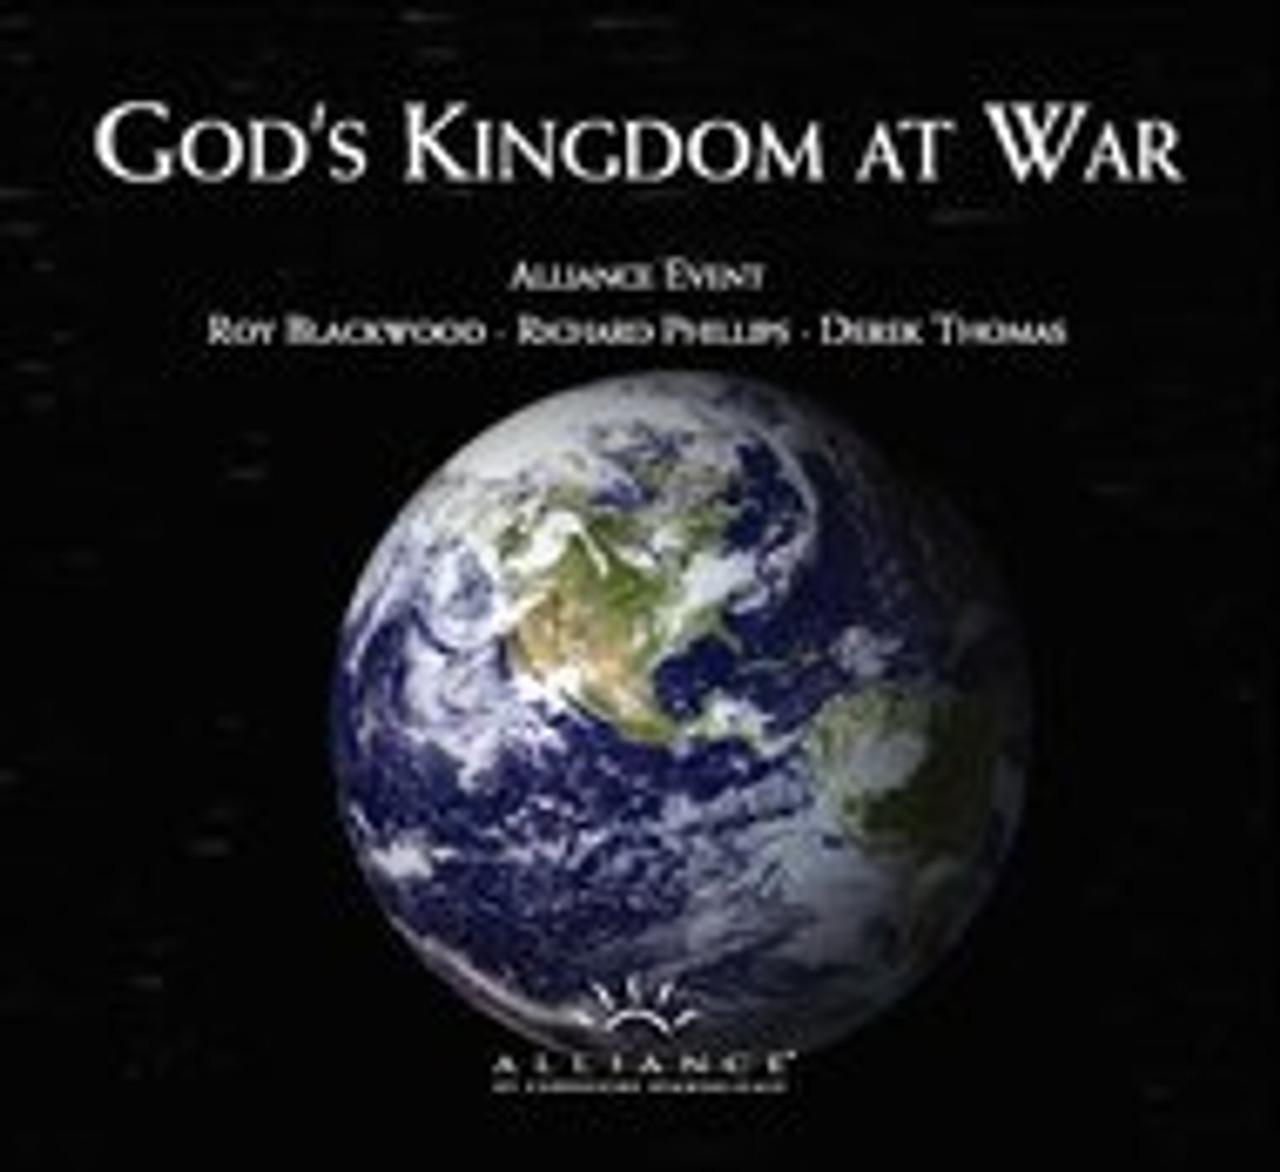 God's Kingdom at War (Richard Phillips)(CD)